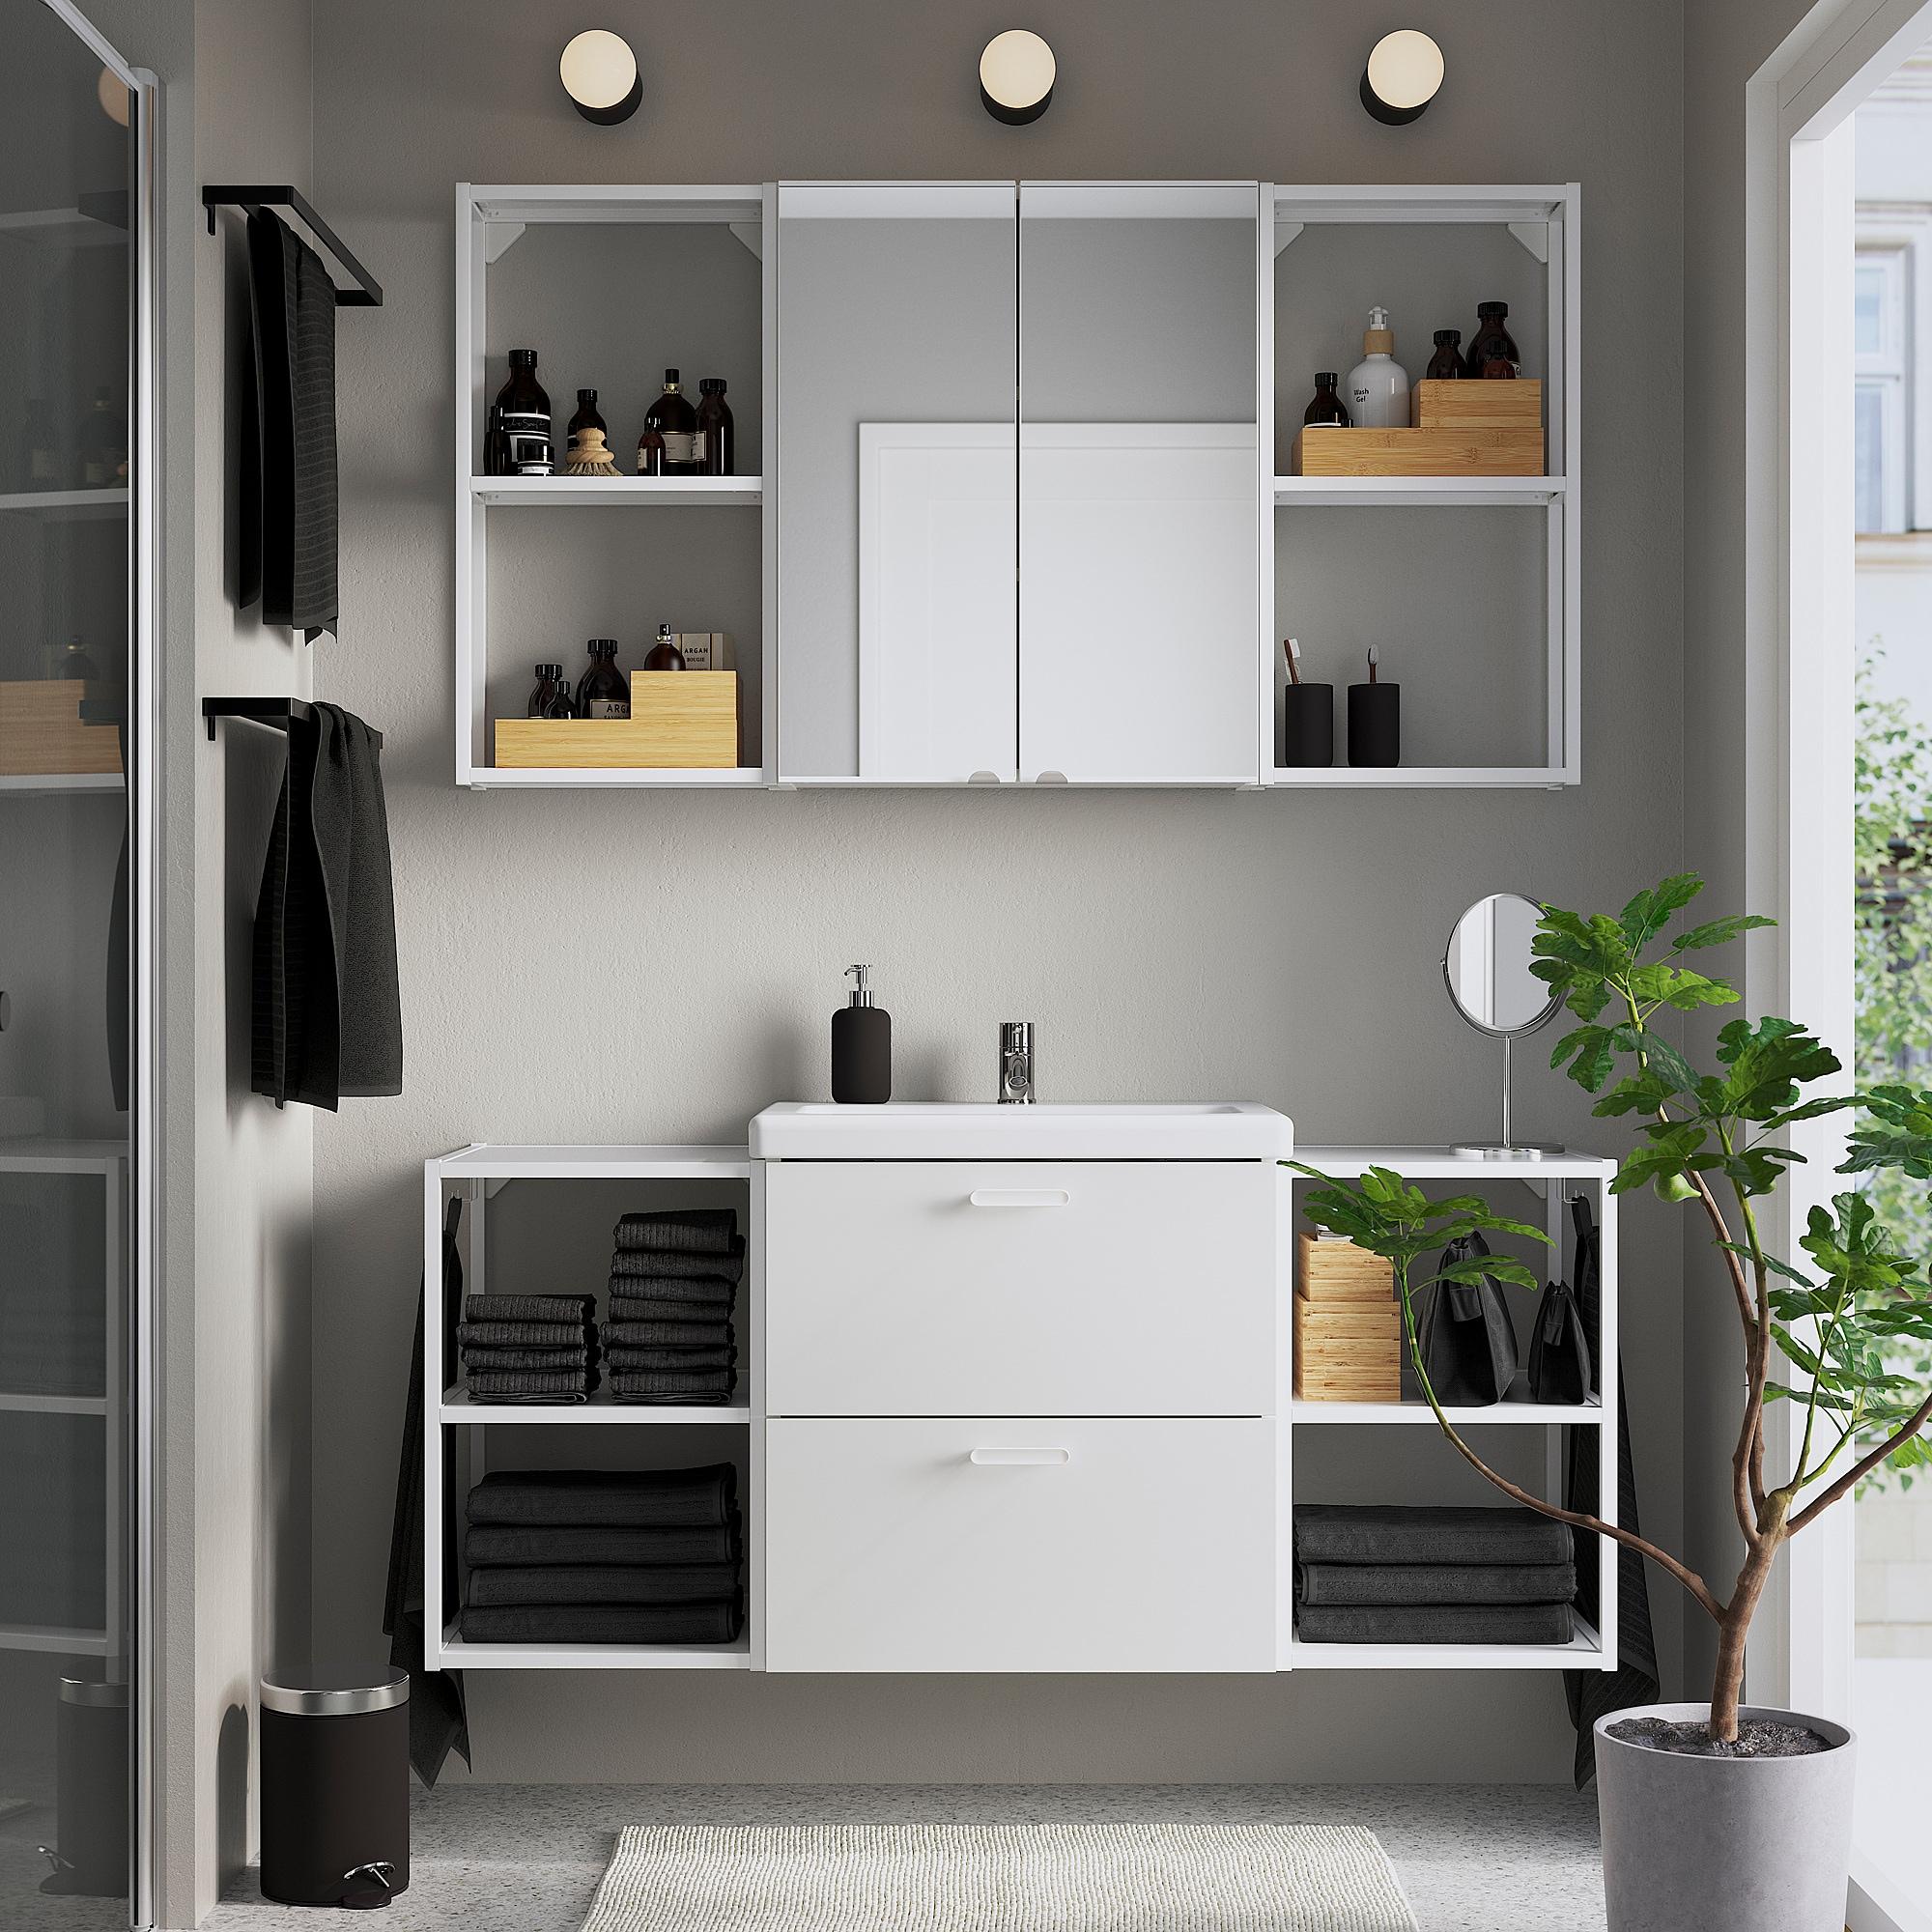 ENHET / TVÄLLEN Bathroom furniture, set of 18, white/Pilkån tap, 140x43x65 cm